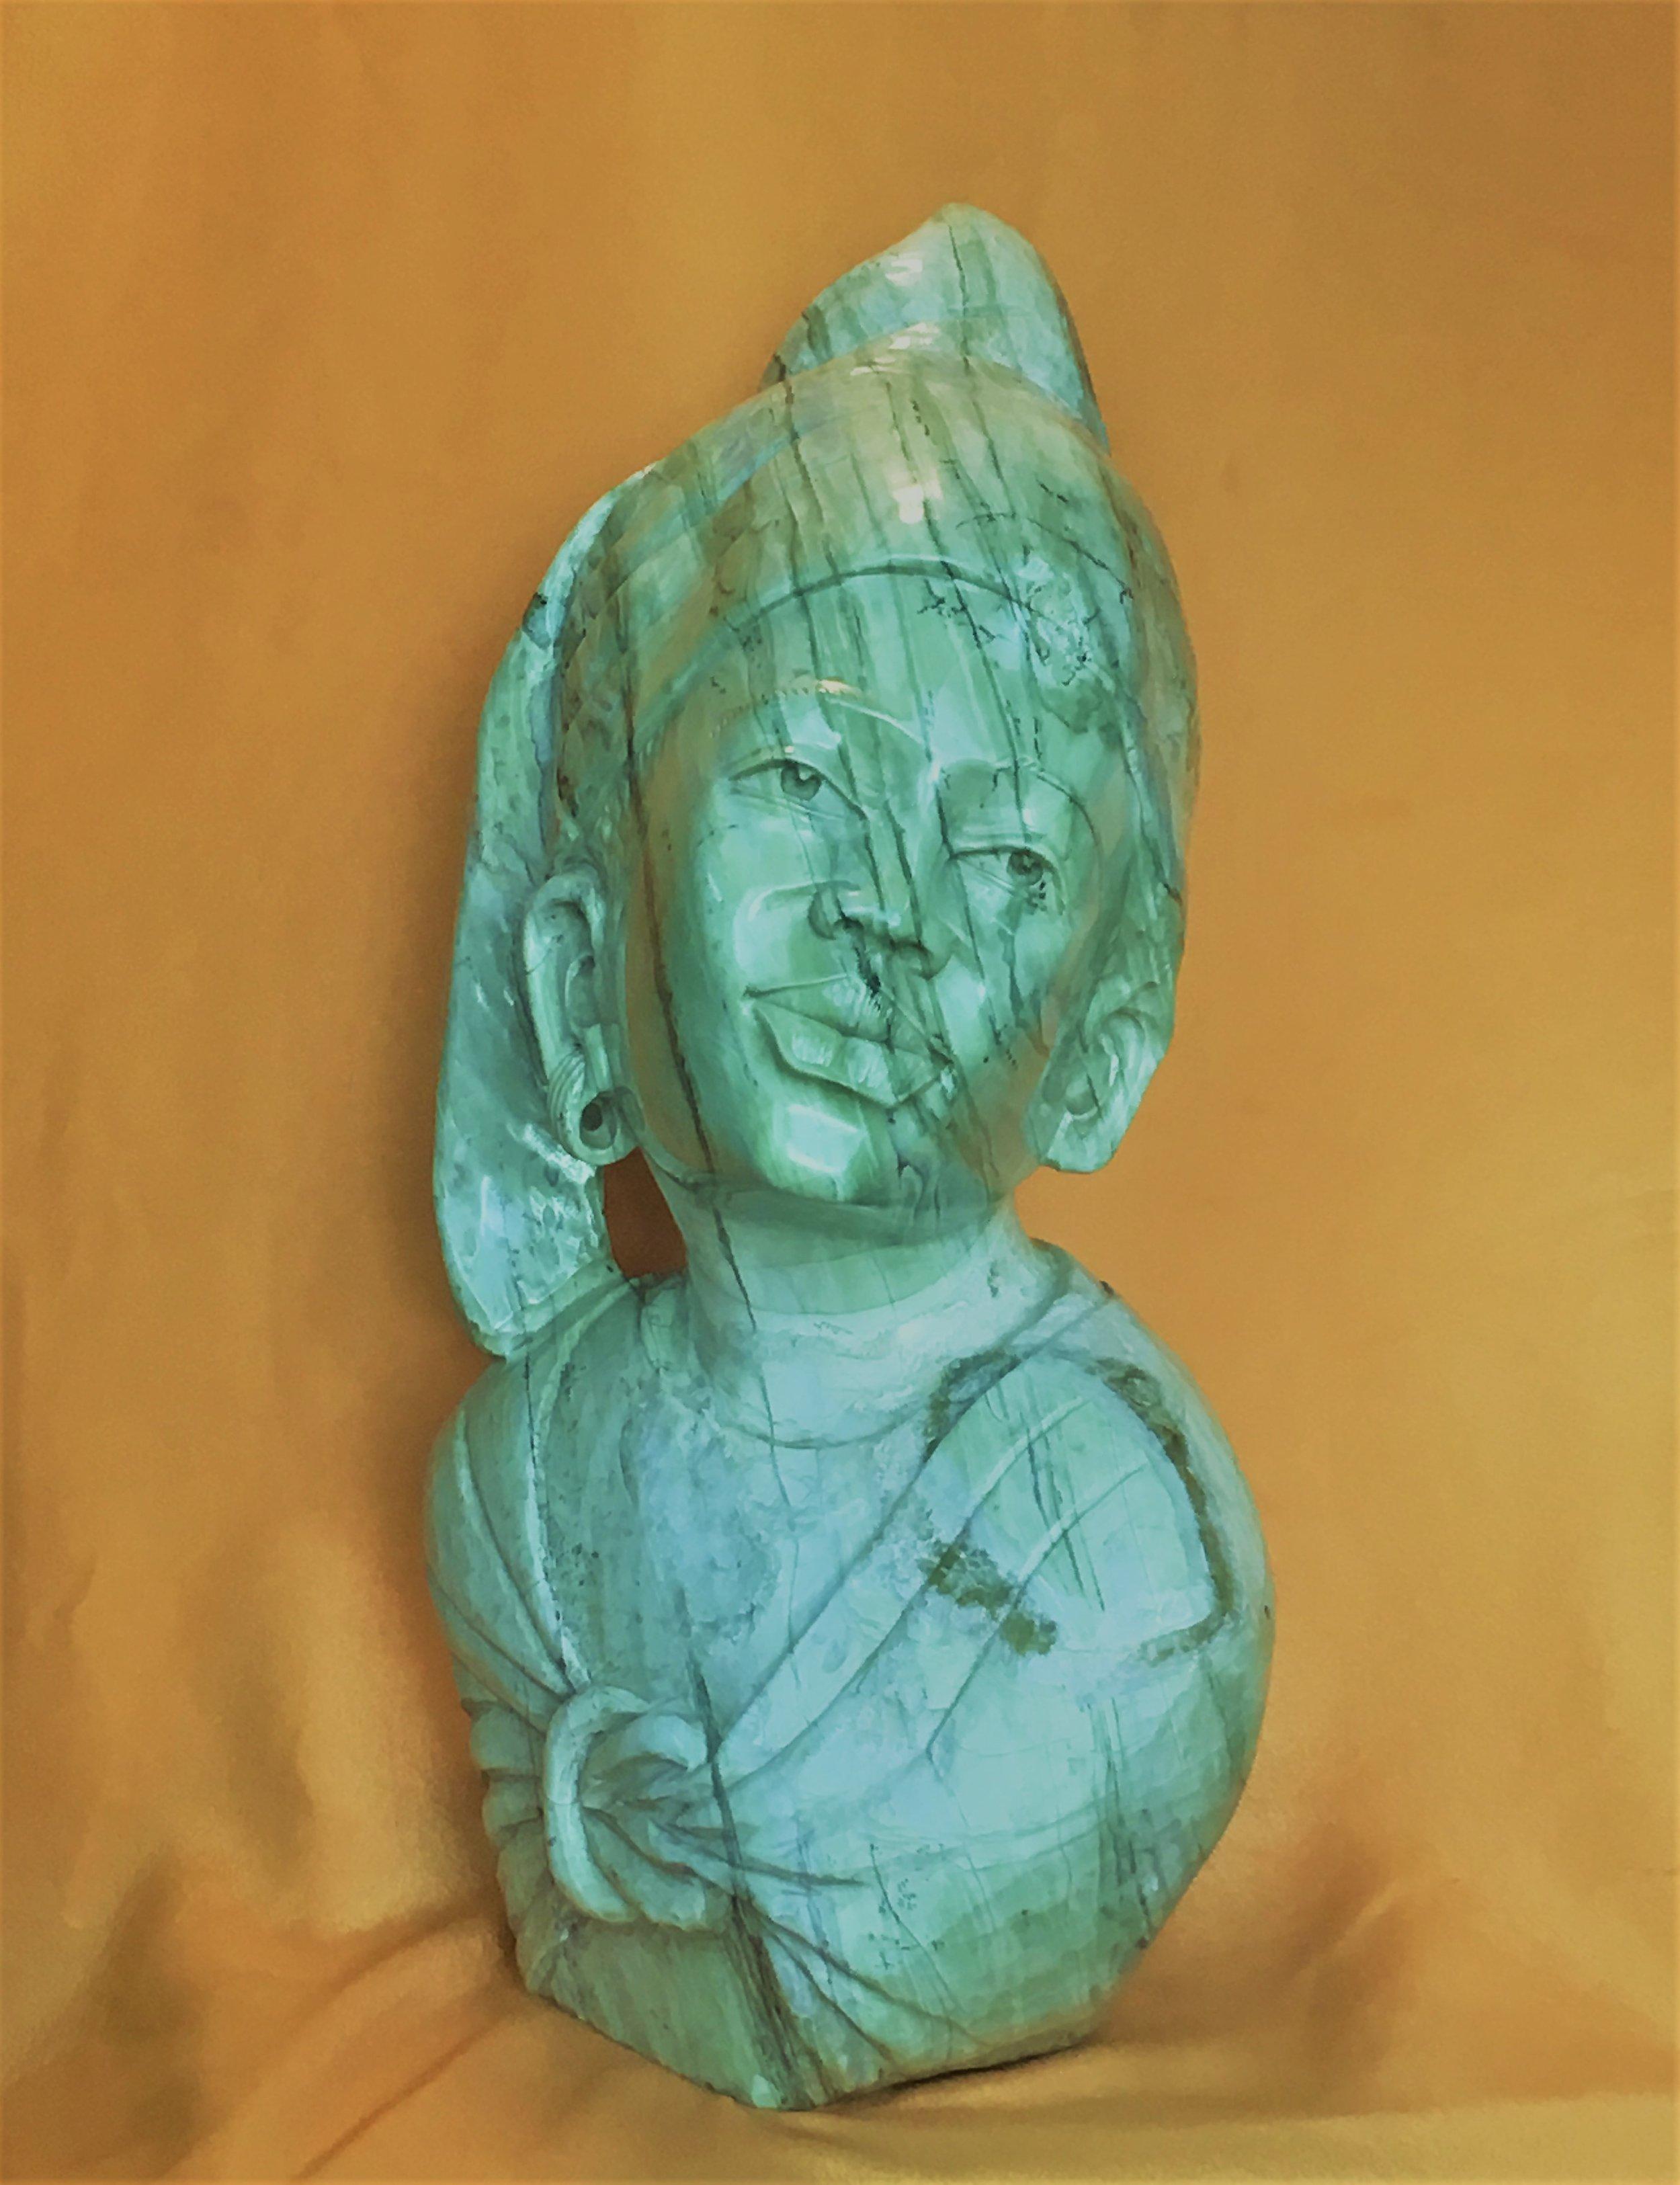 Shona stone Female Butter Jade by E. Katombera